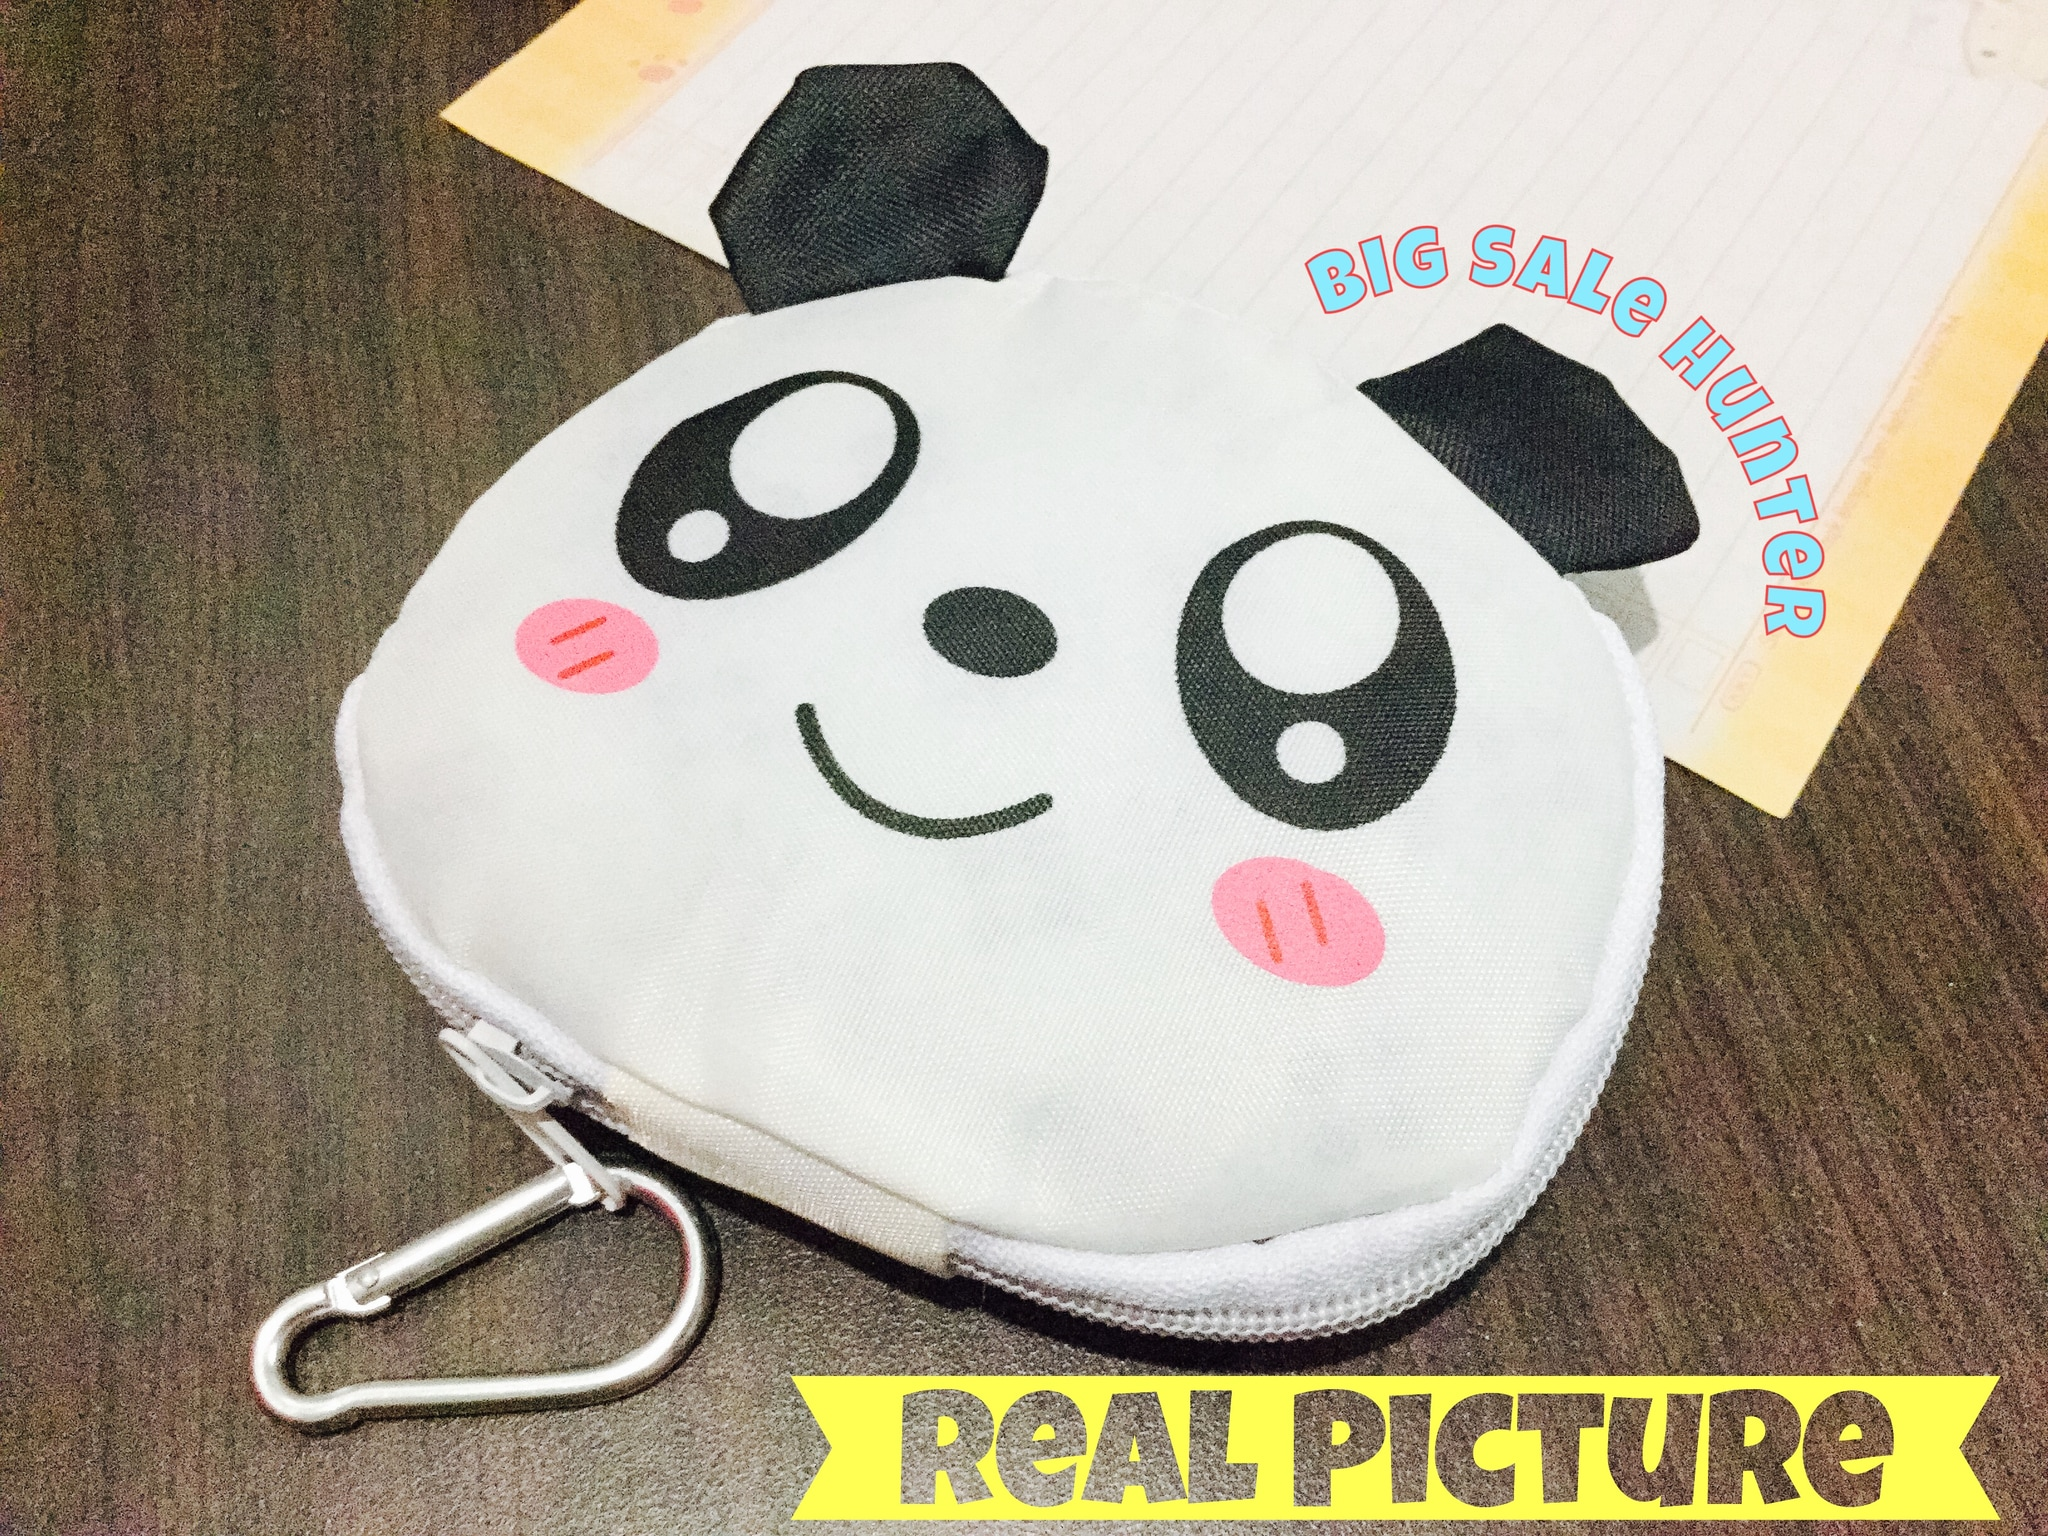 Jual Tas Les Shopping Belanja Karakter Panda Lucu Bisa Dilipat Dompet Barang Jadi Kecil Big Sale Hunter Tokopedia